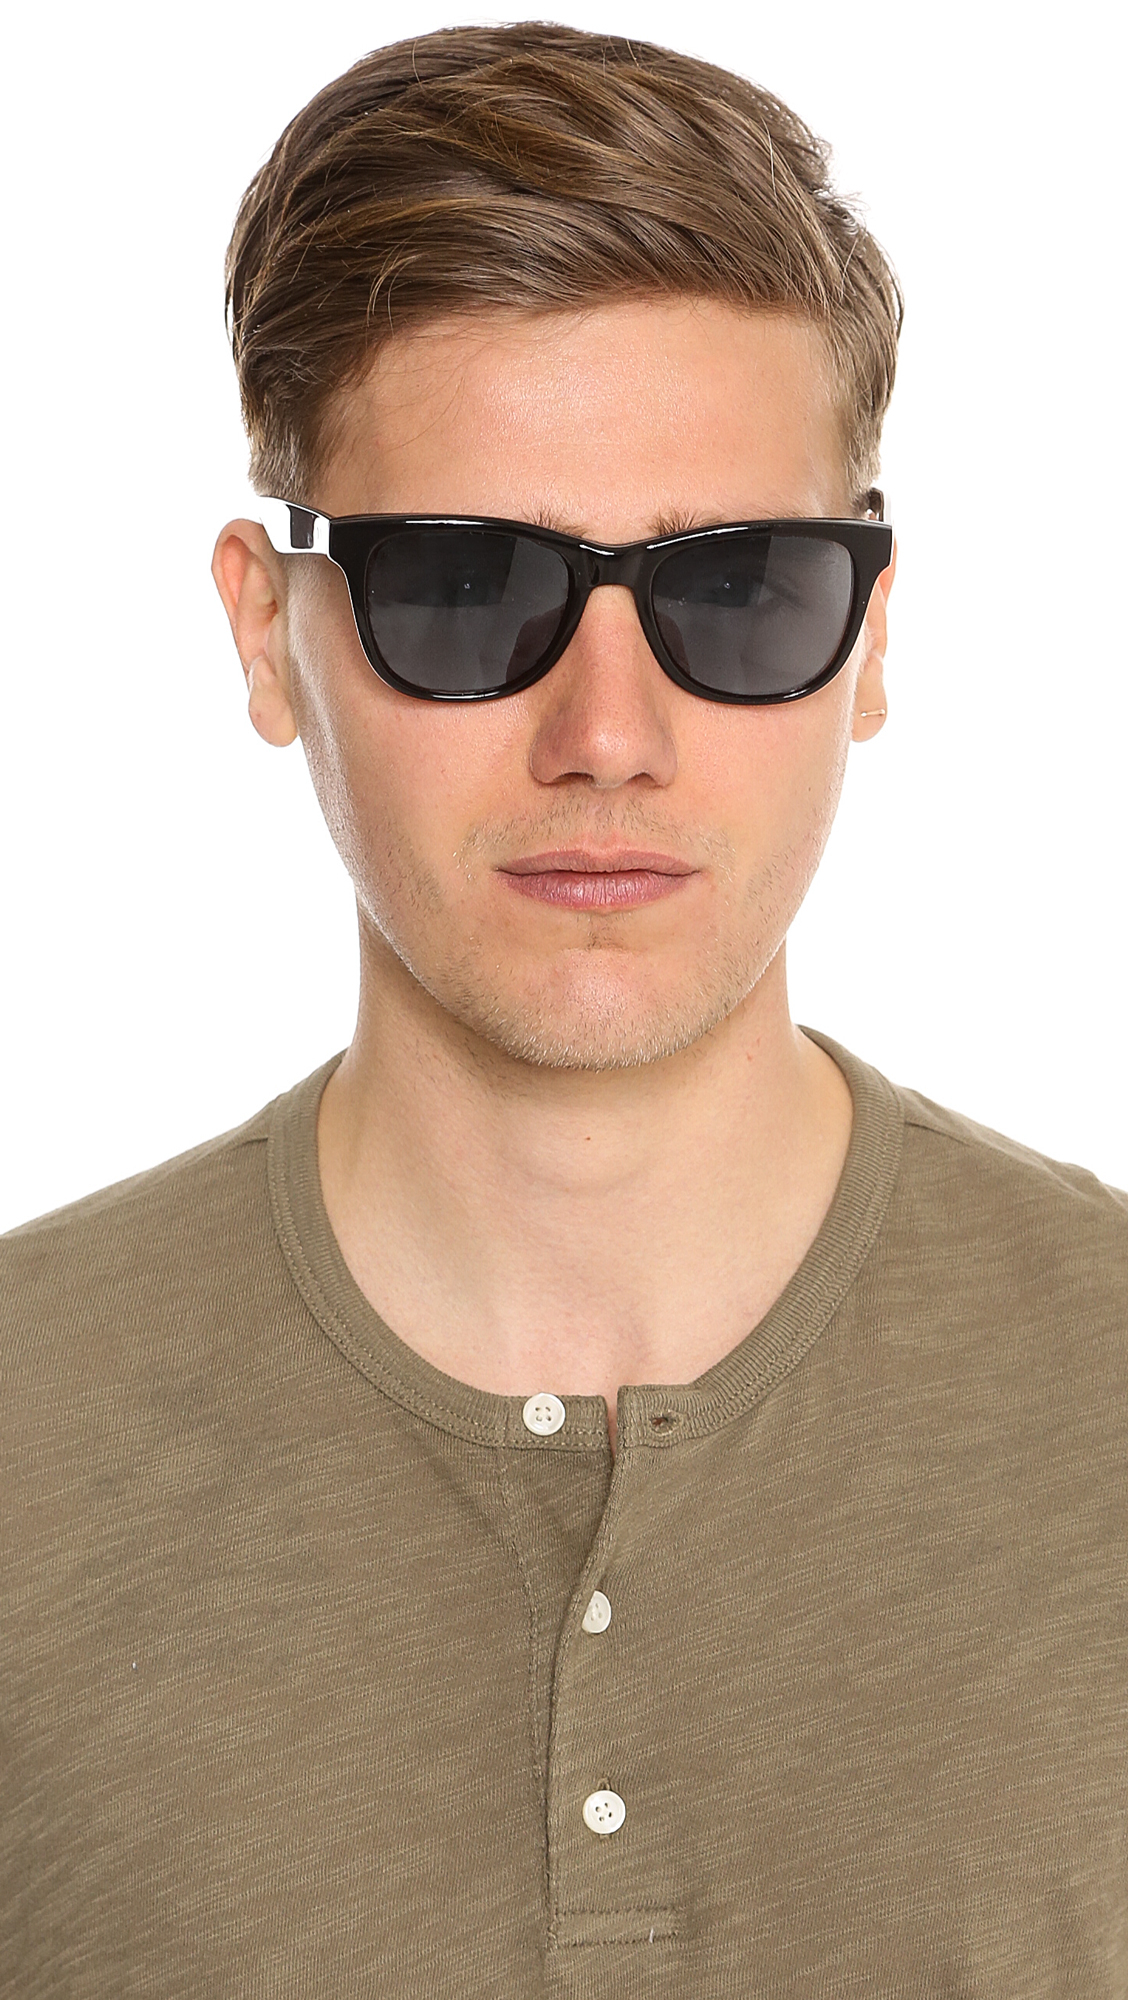 Lyst - Paul Smith Berman Polarized Sunglasses in Black for Men